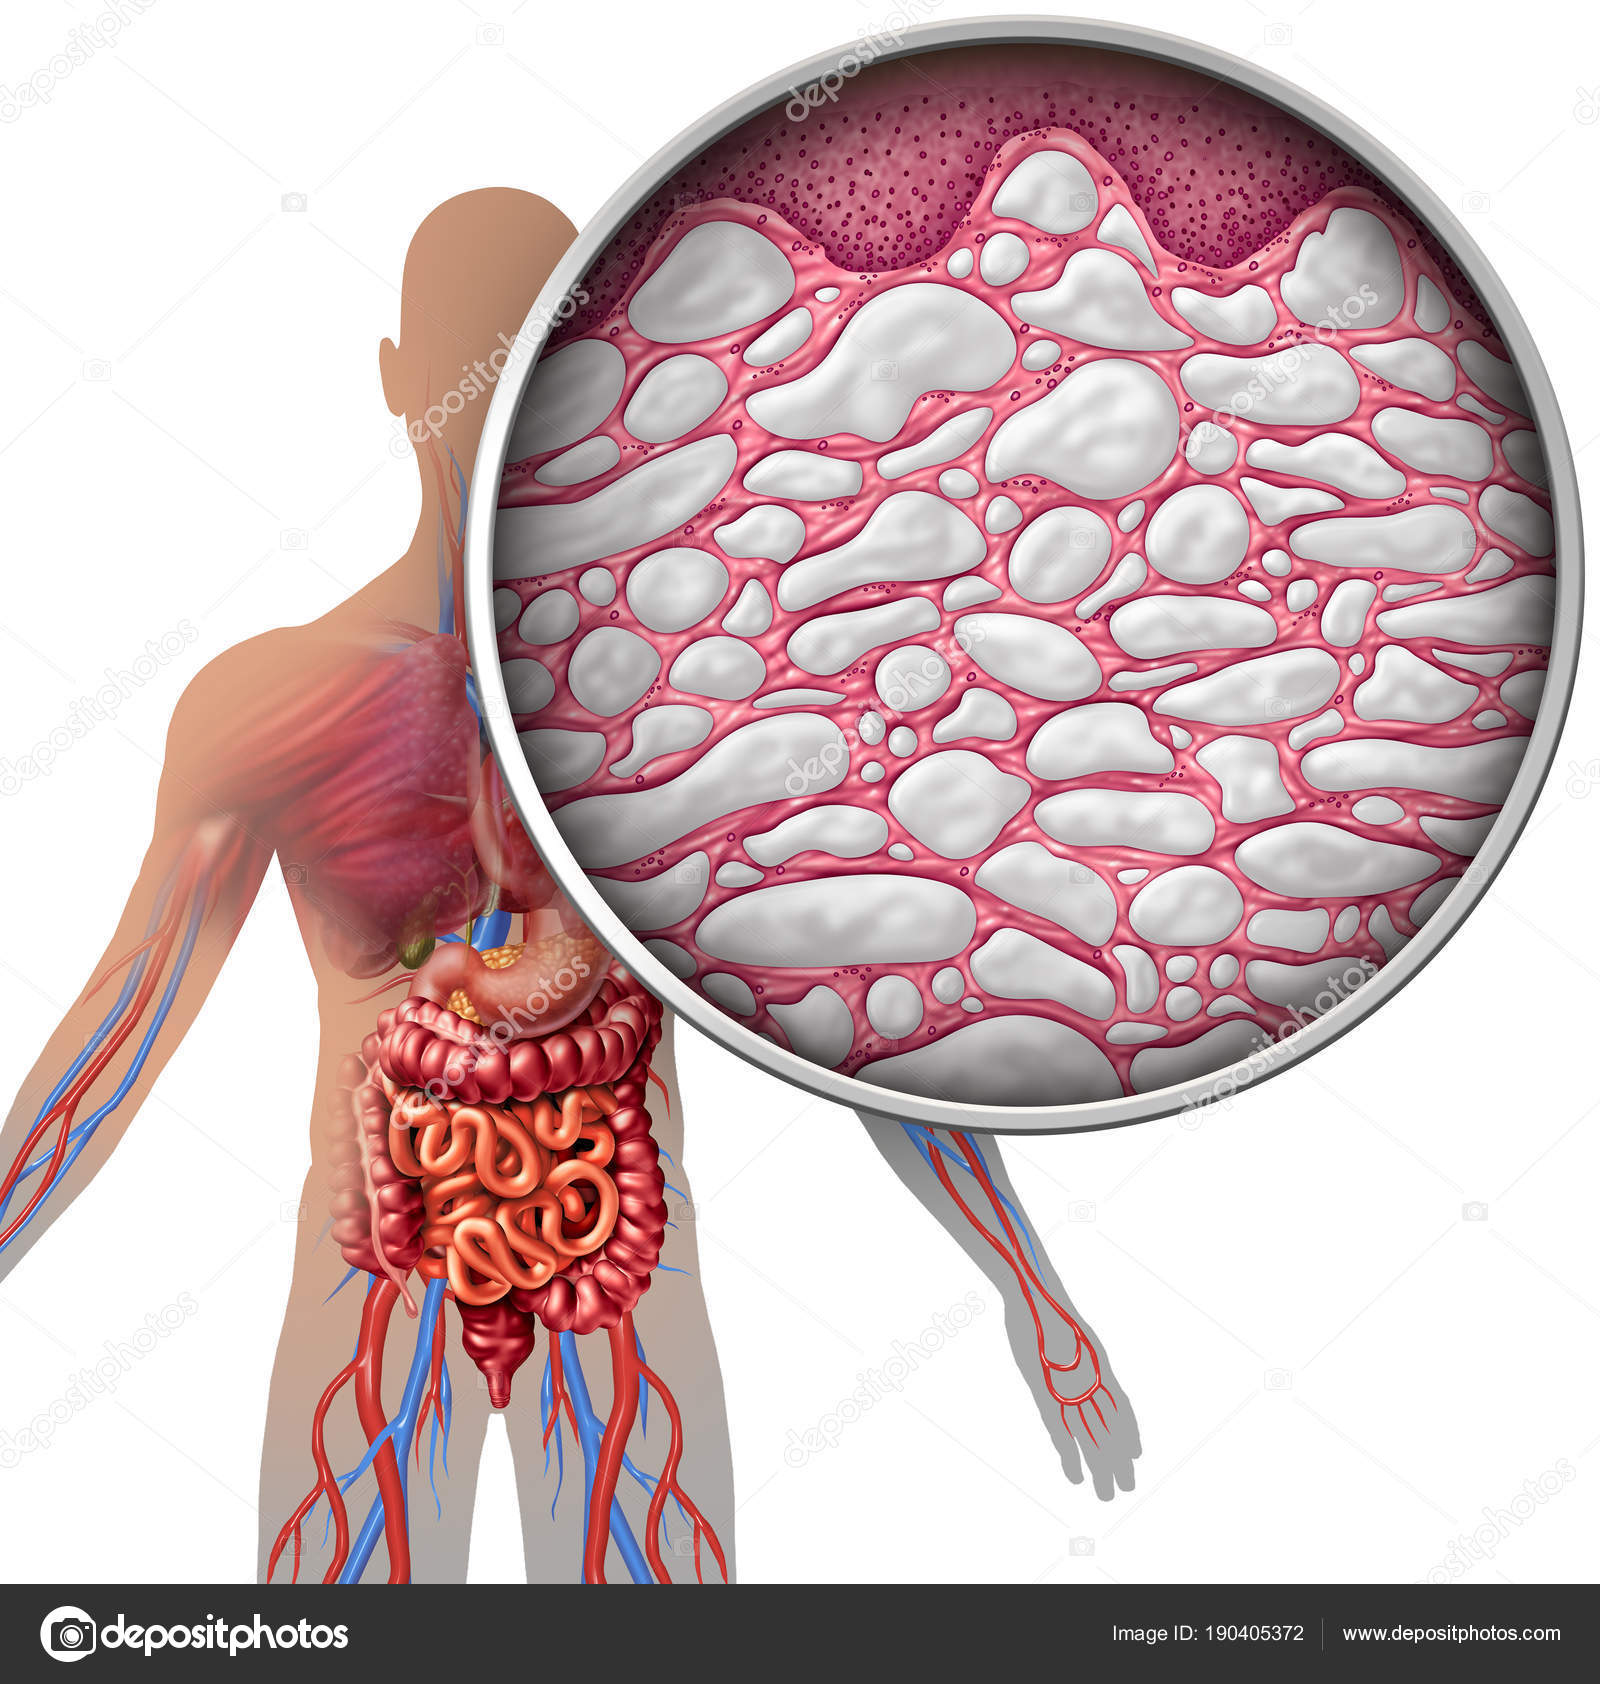 Interstitium Human Body Anatomy — Stock Photo © lightsource #190405372